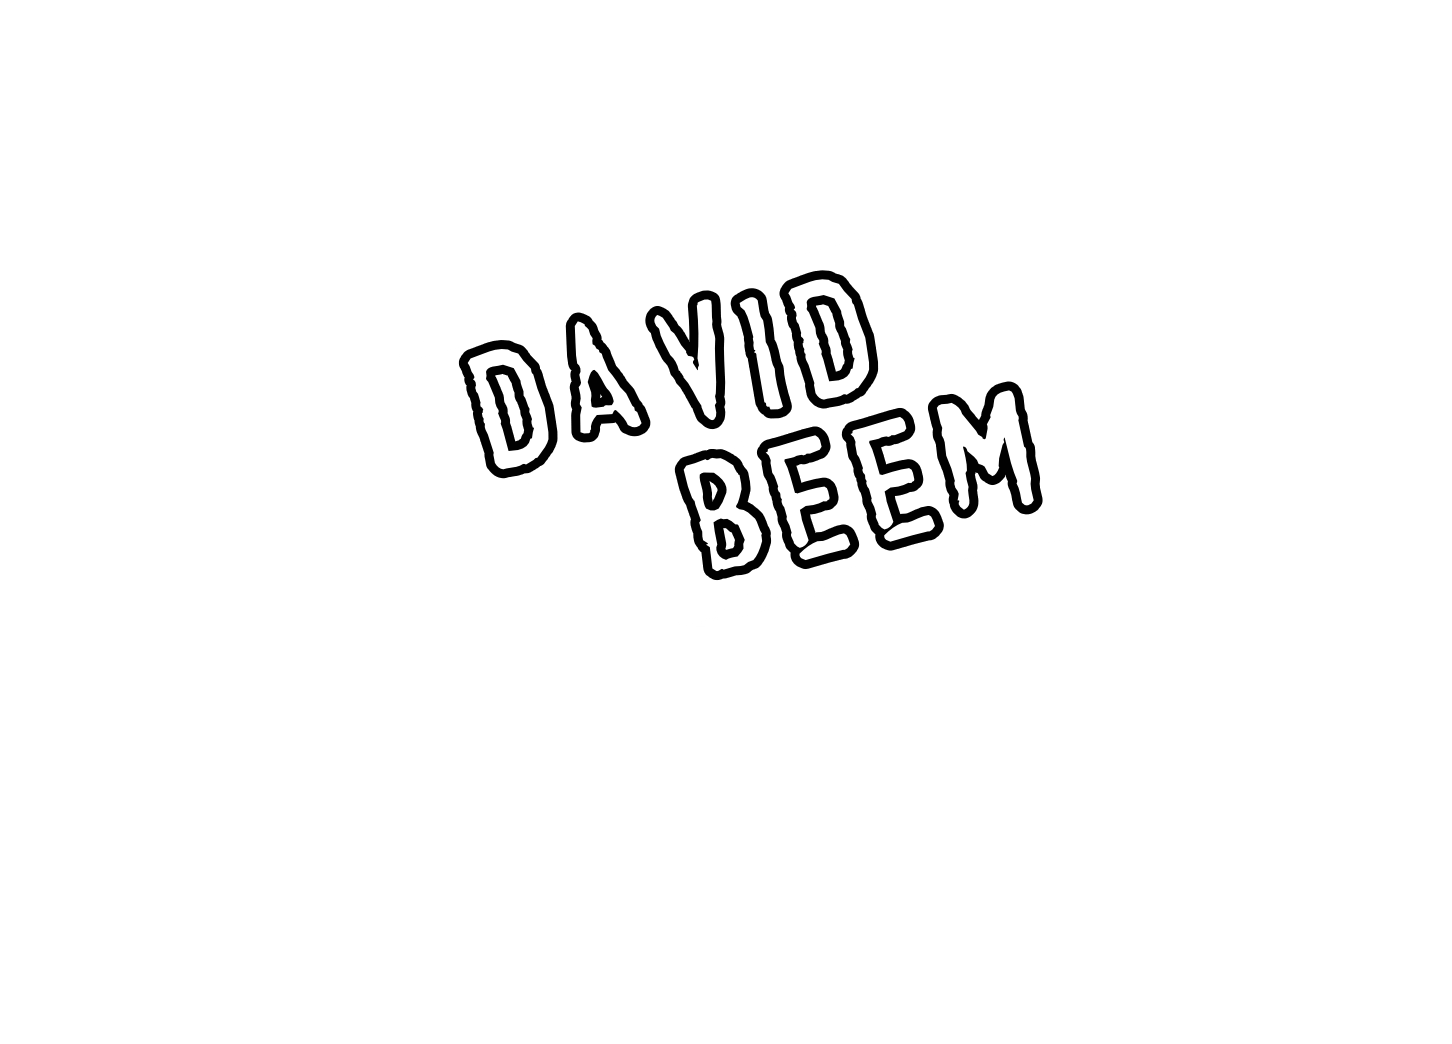 David Beem, Author